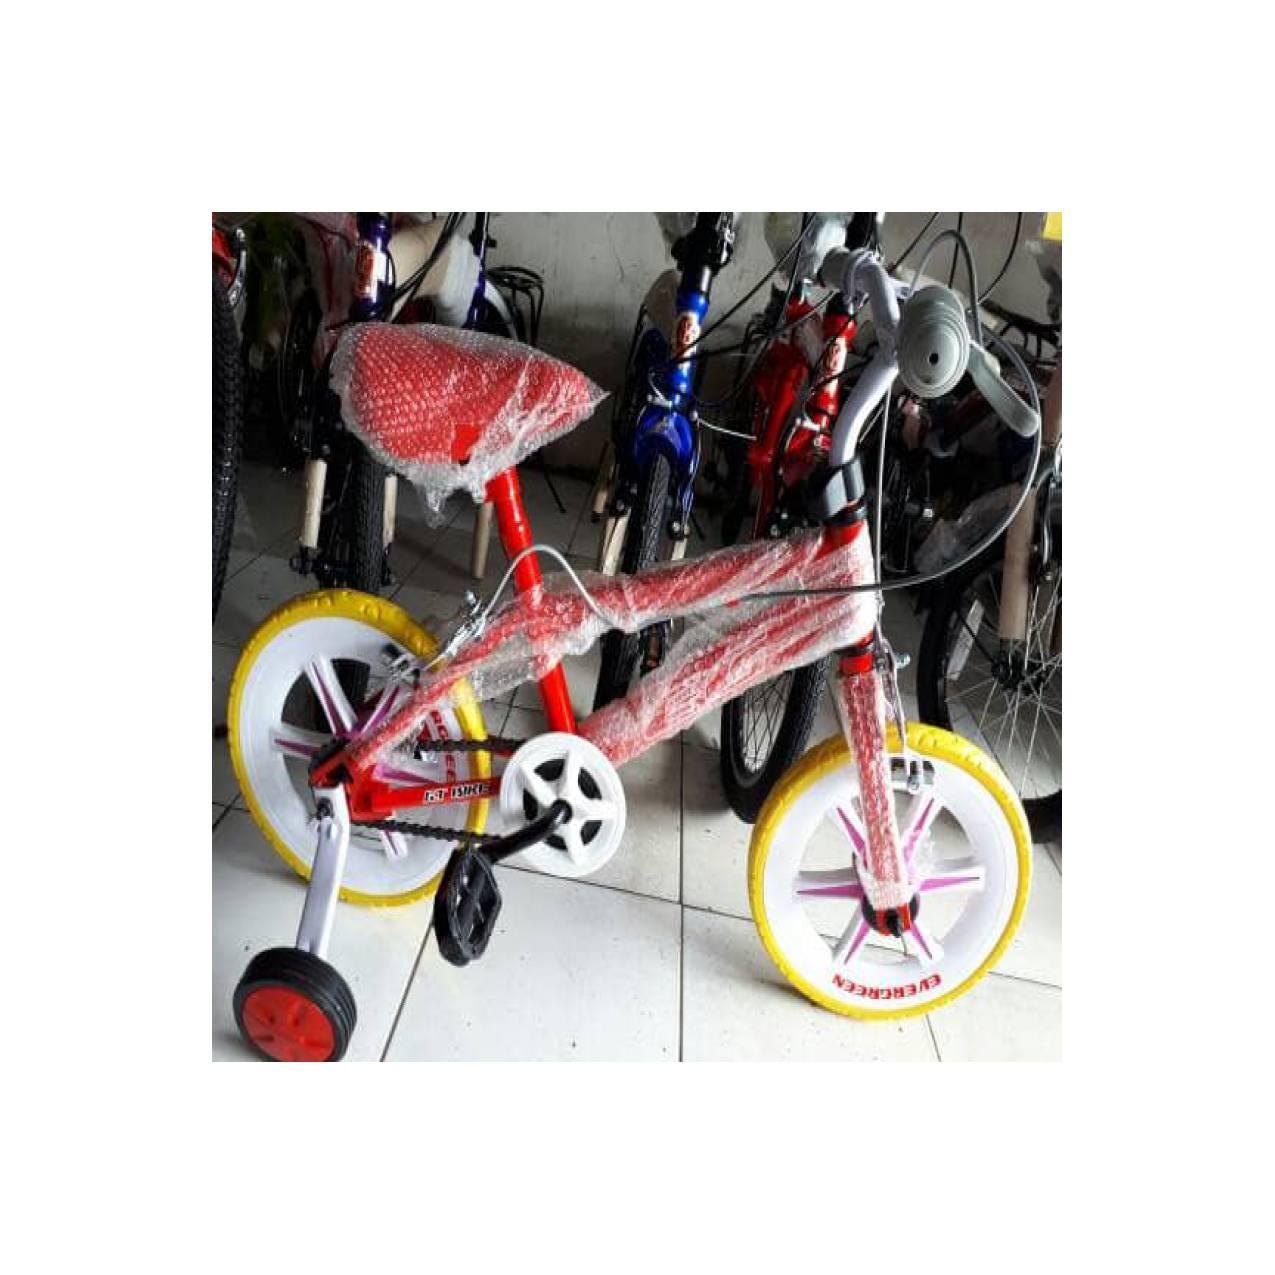 Sepeda 12 Evergreen Ban Busa Tebel Pake Doltrap